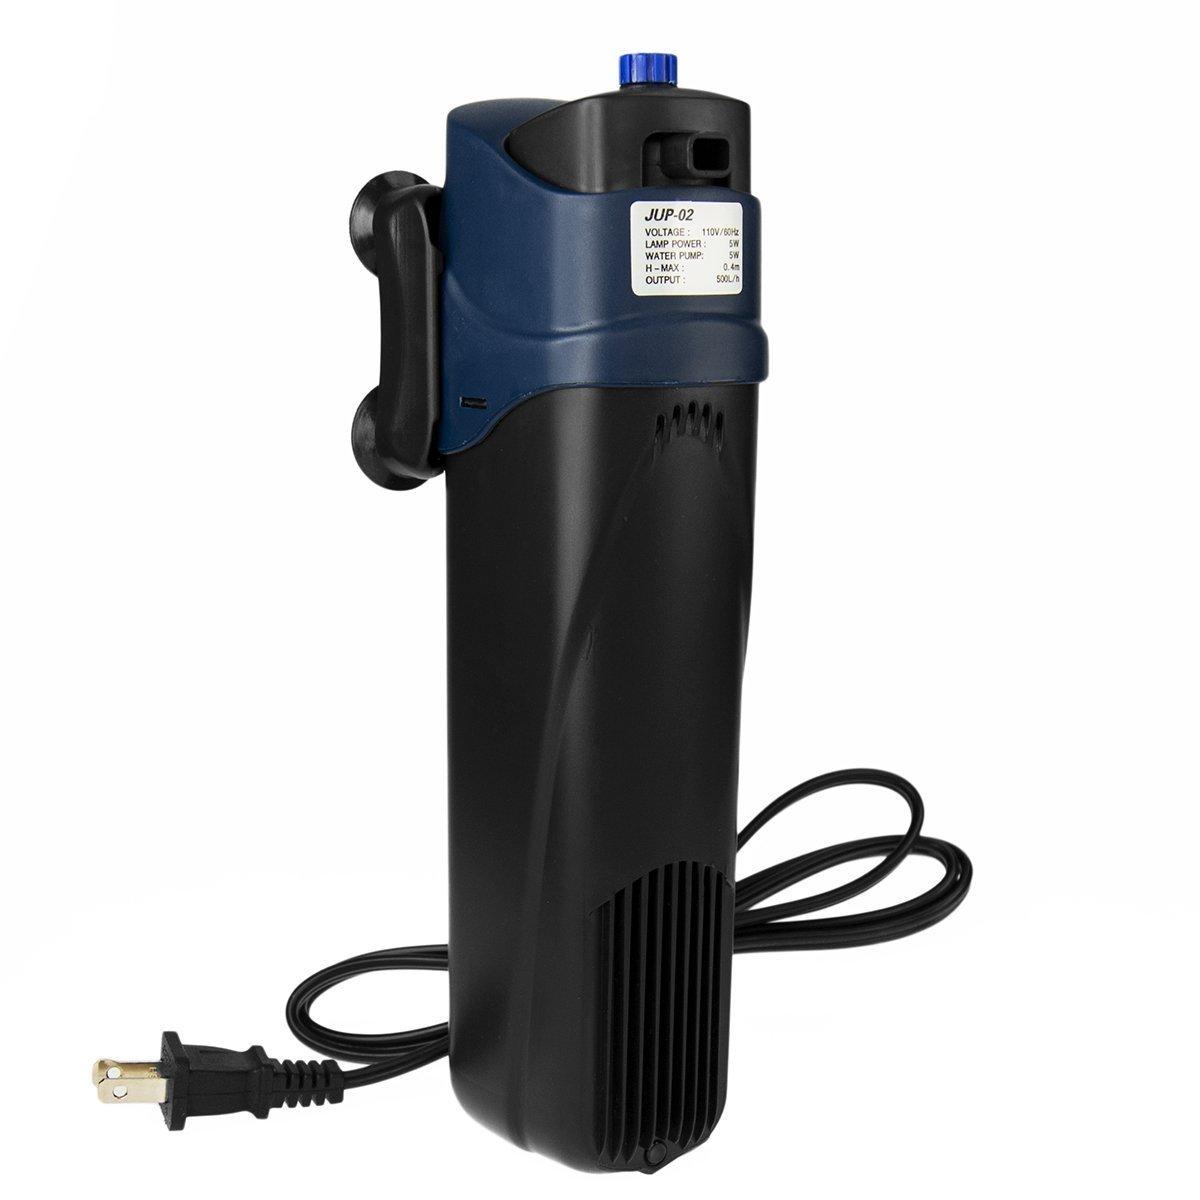 SUN Jup-02 5W Uv Sterilizer Submersible Filter Pump for Aquarium, 40 gal